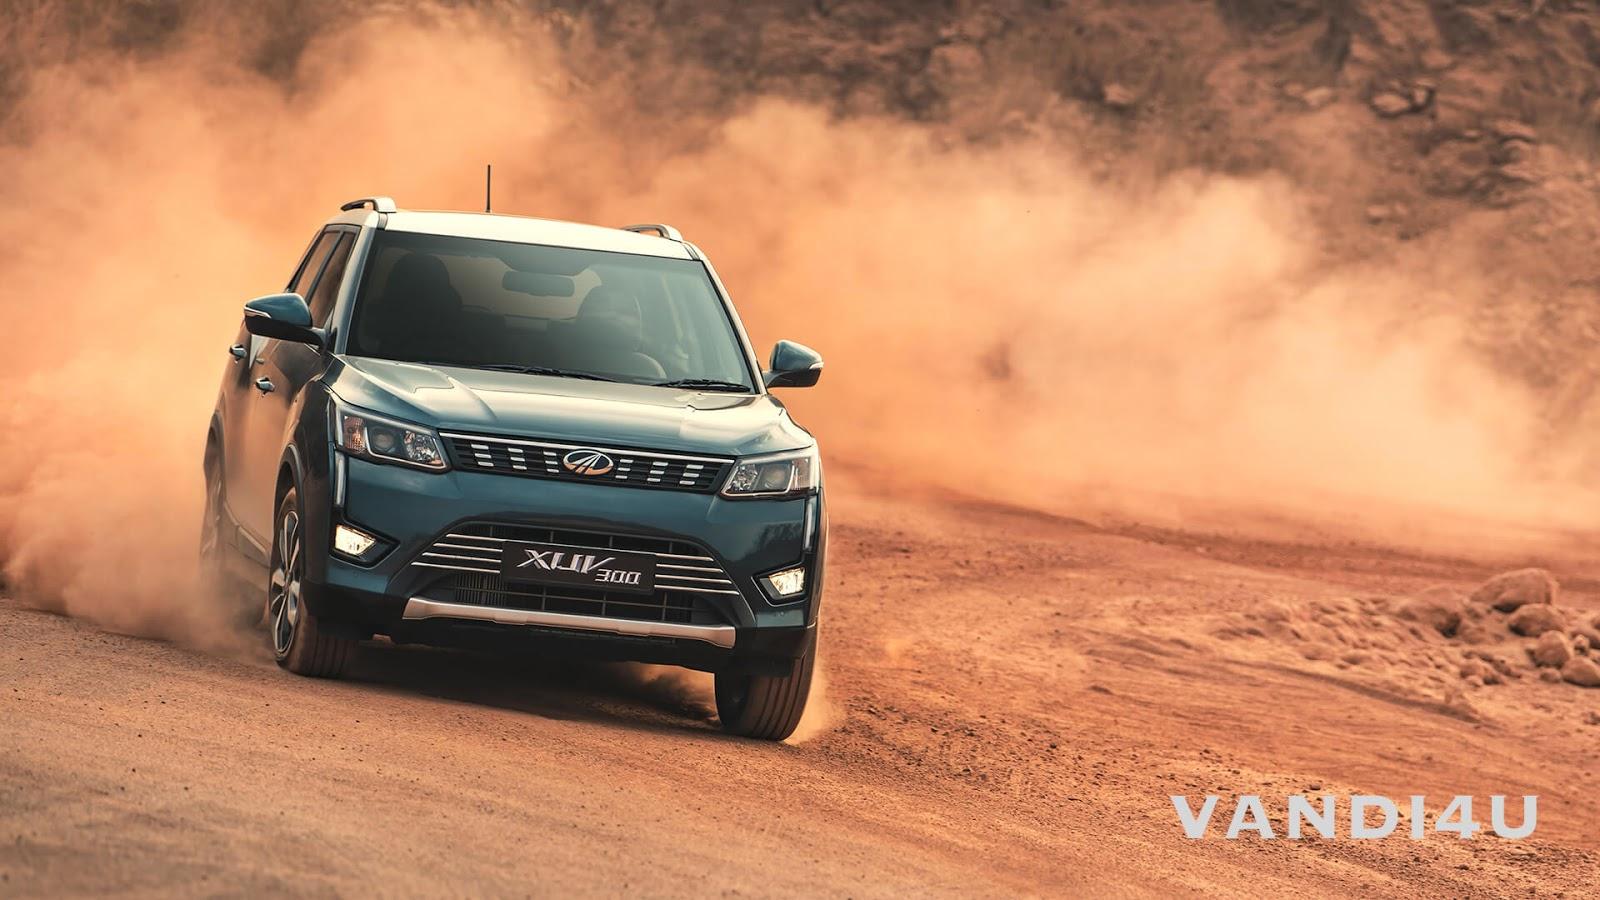 Mahindra XUV300 becomes Safest Car in India   VANDI4U